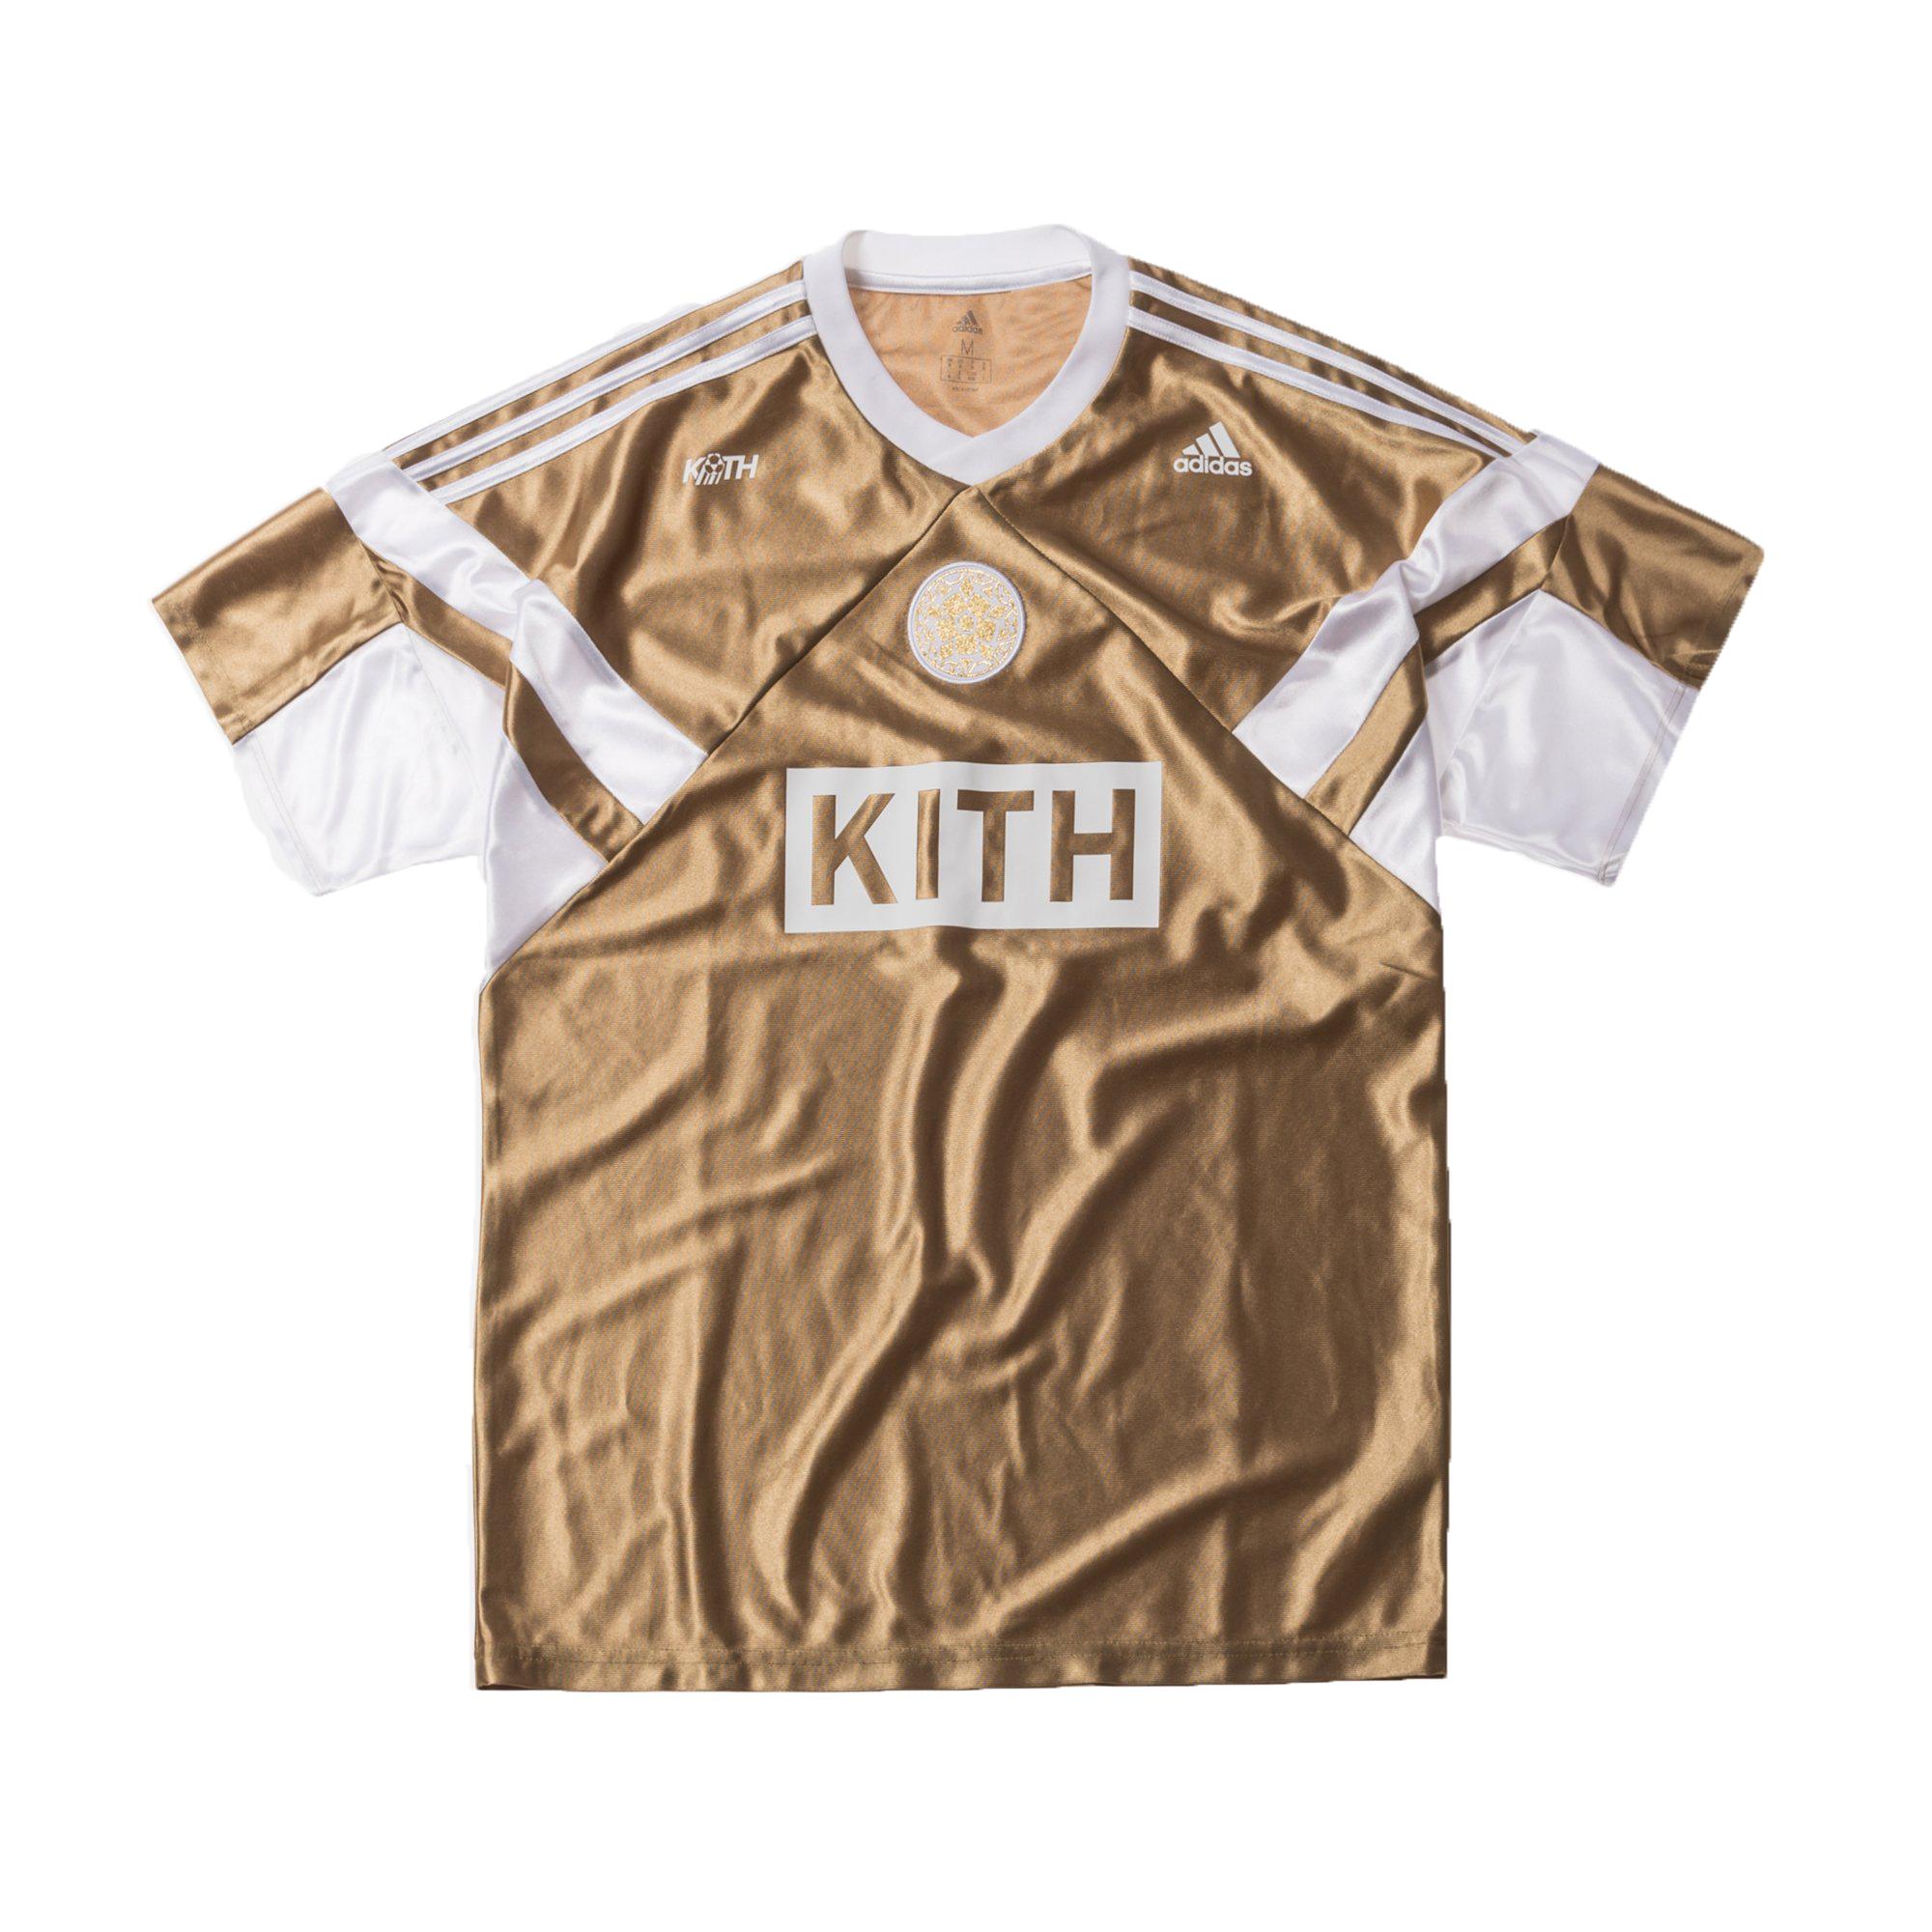 Kith x adidas Match Jersey Rays Away